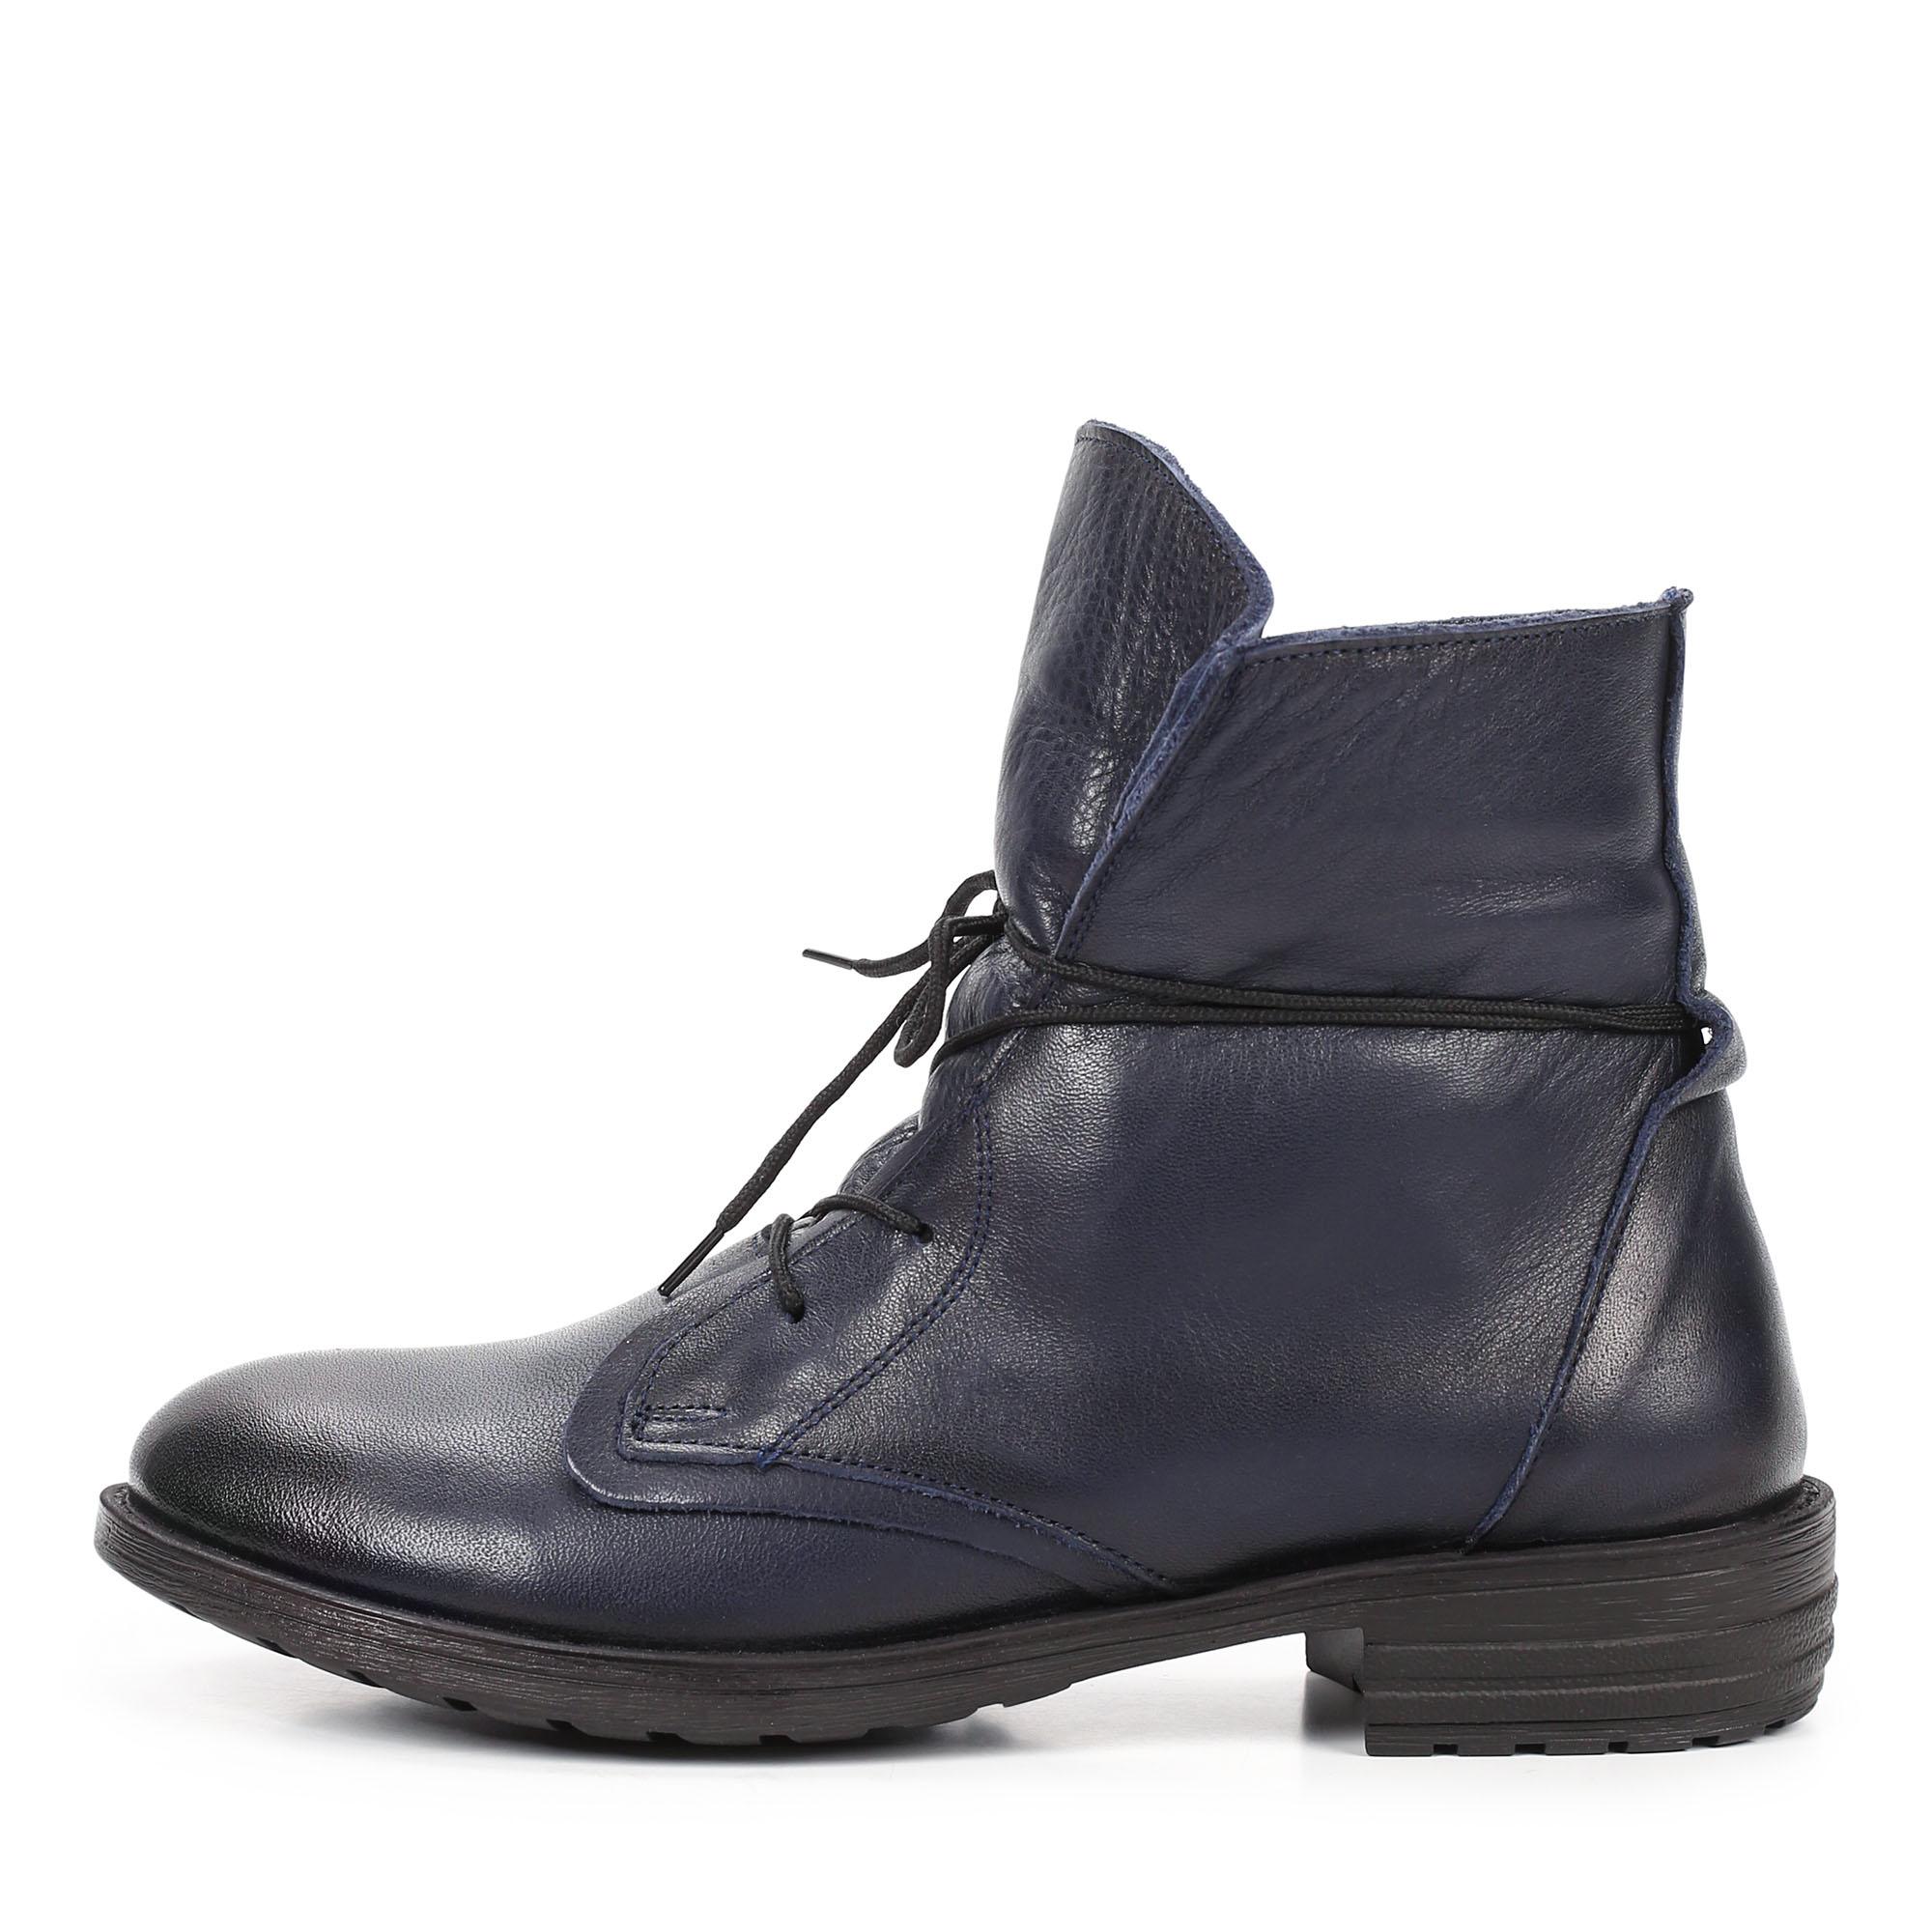 Ботинки Thomas Munz 539-013A-2103